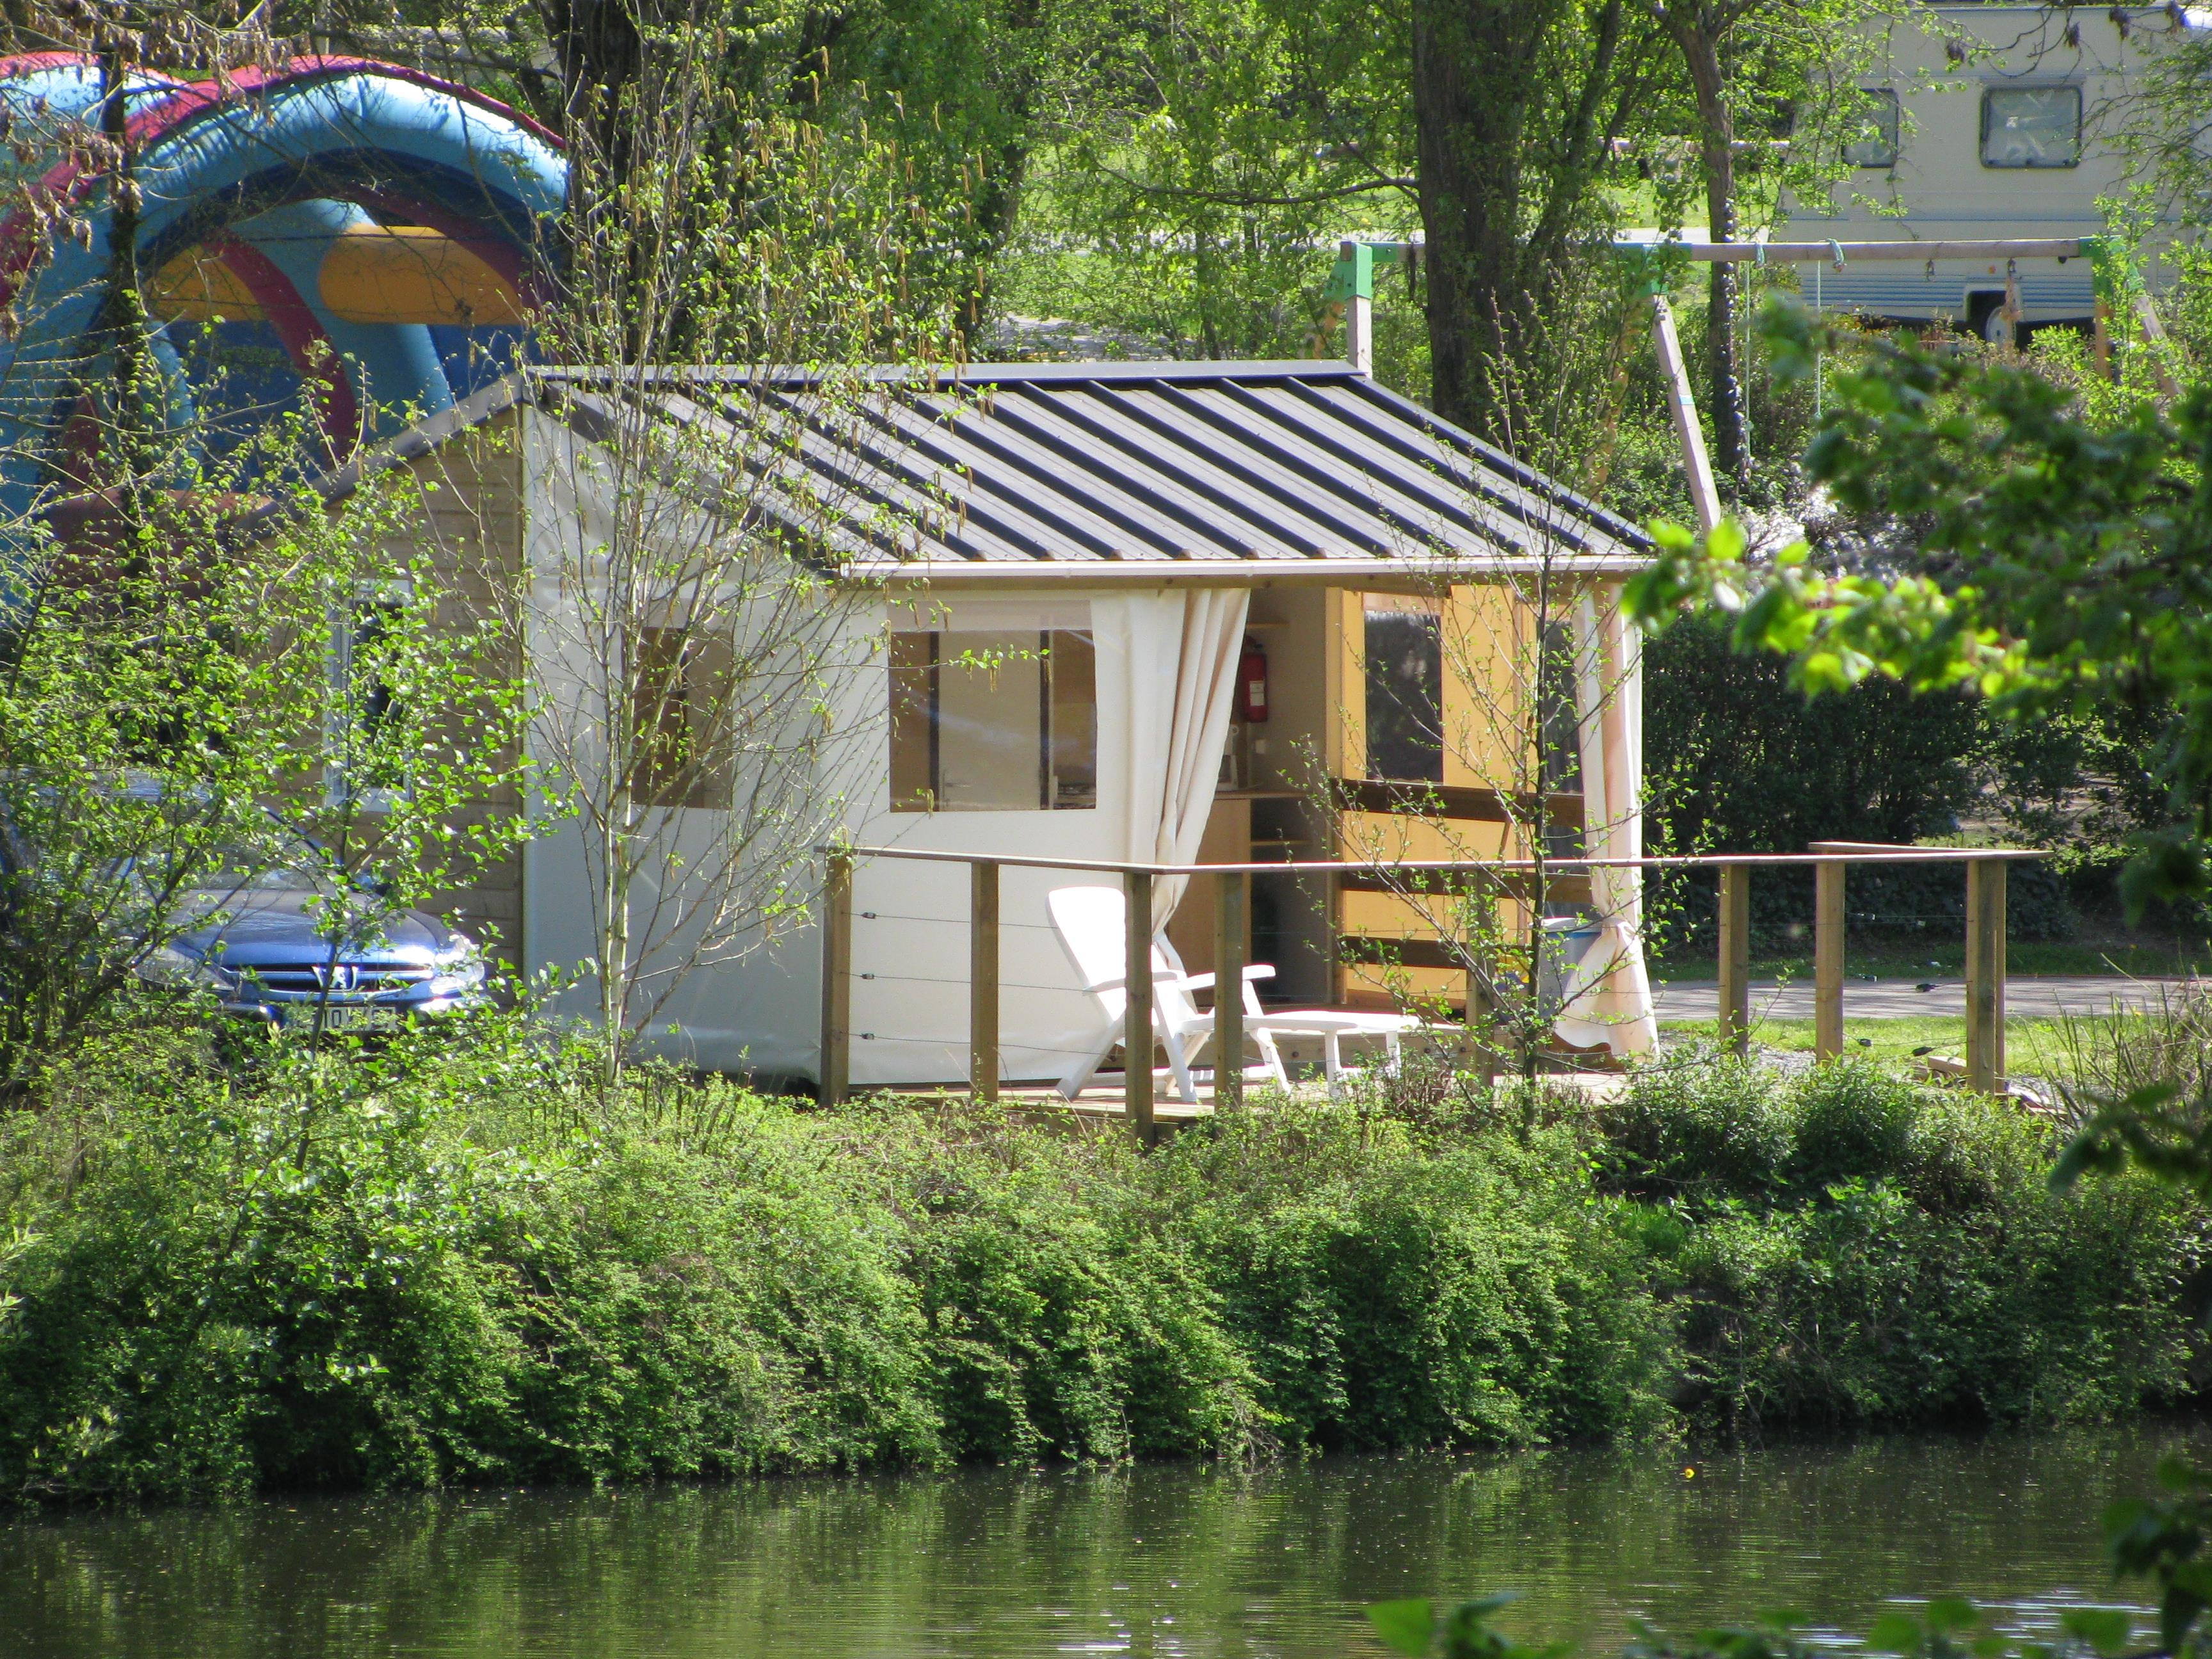 Camping des Rochers des Parcs, Clécy, Calvados